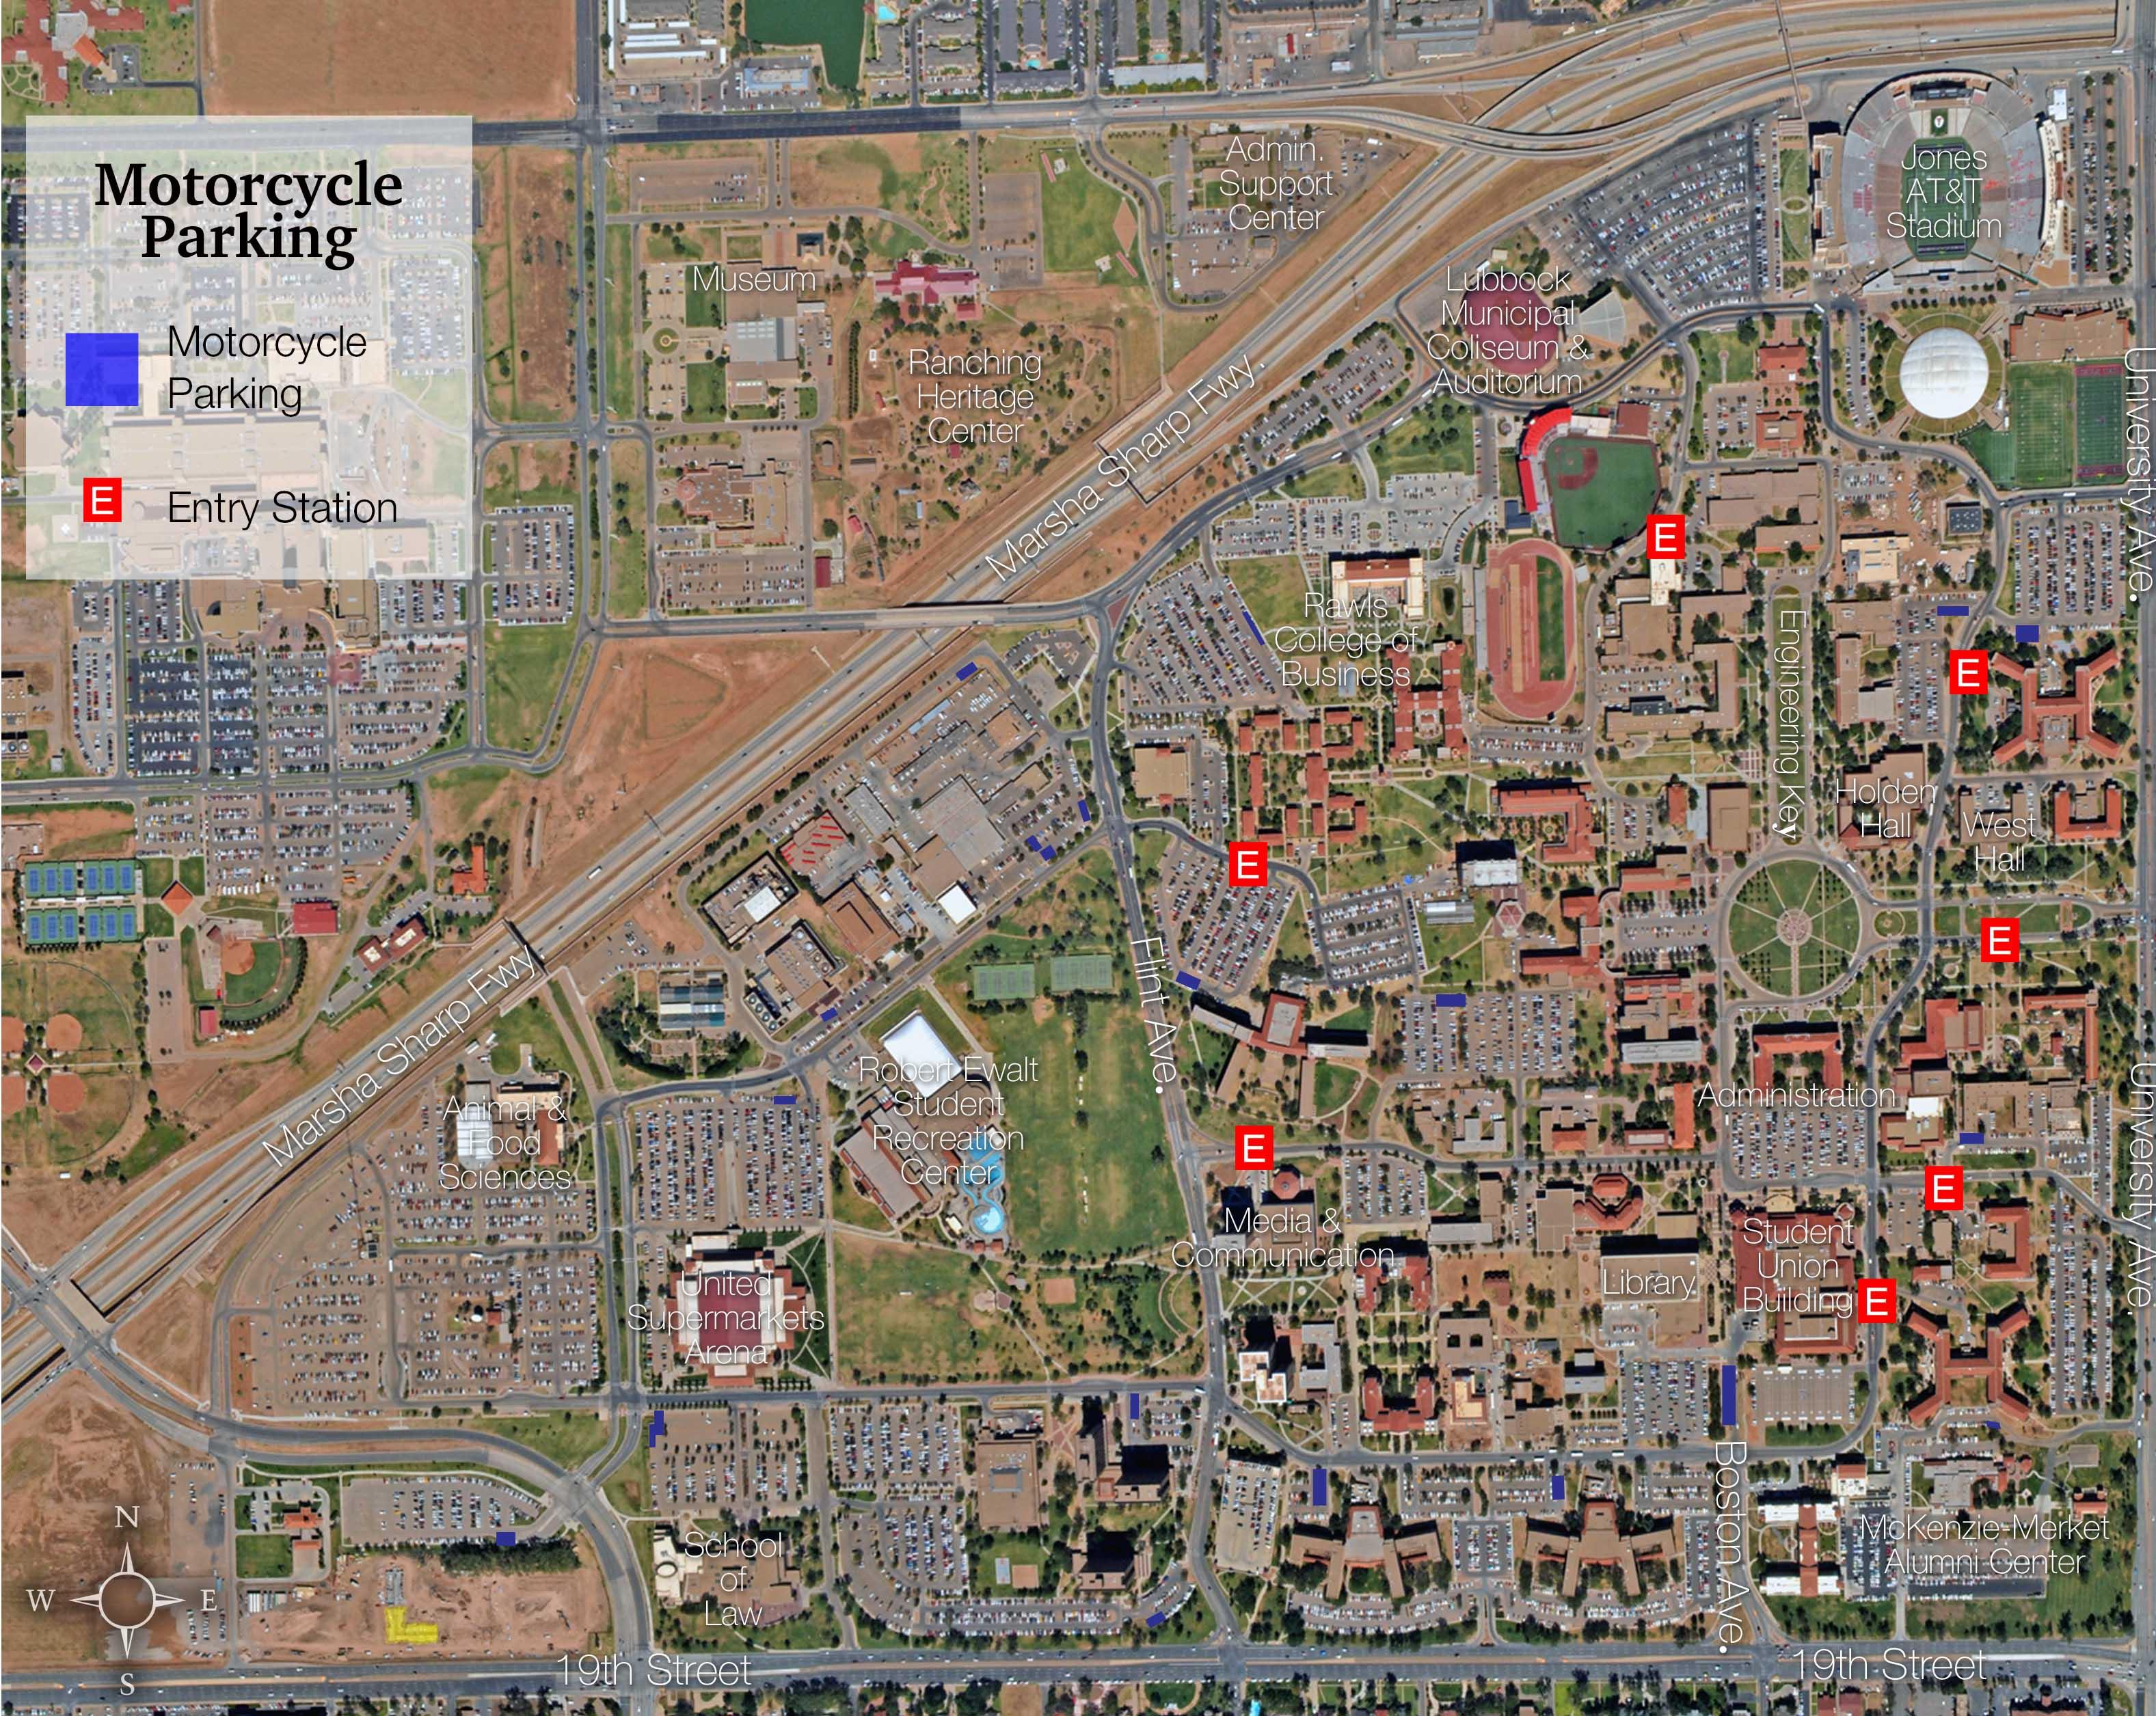 Campus Maps | Transportation & Parking Services | Ttu - Texas Tech Housing Map